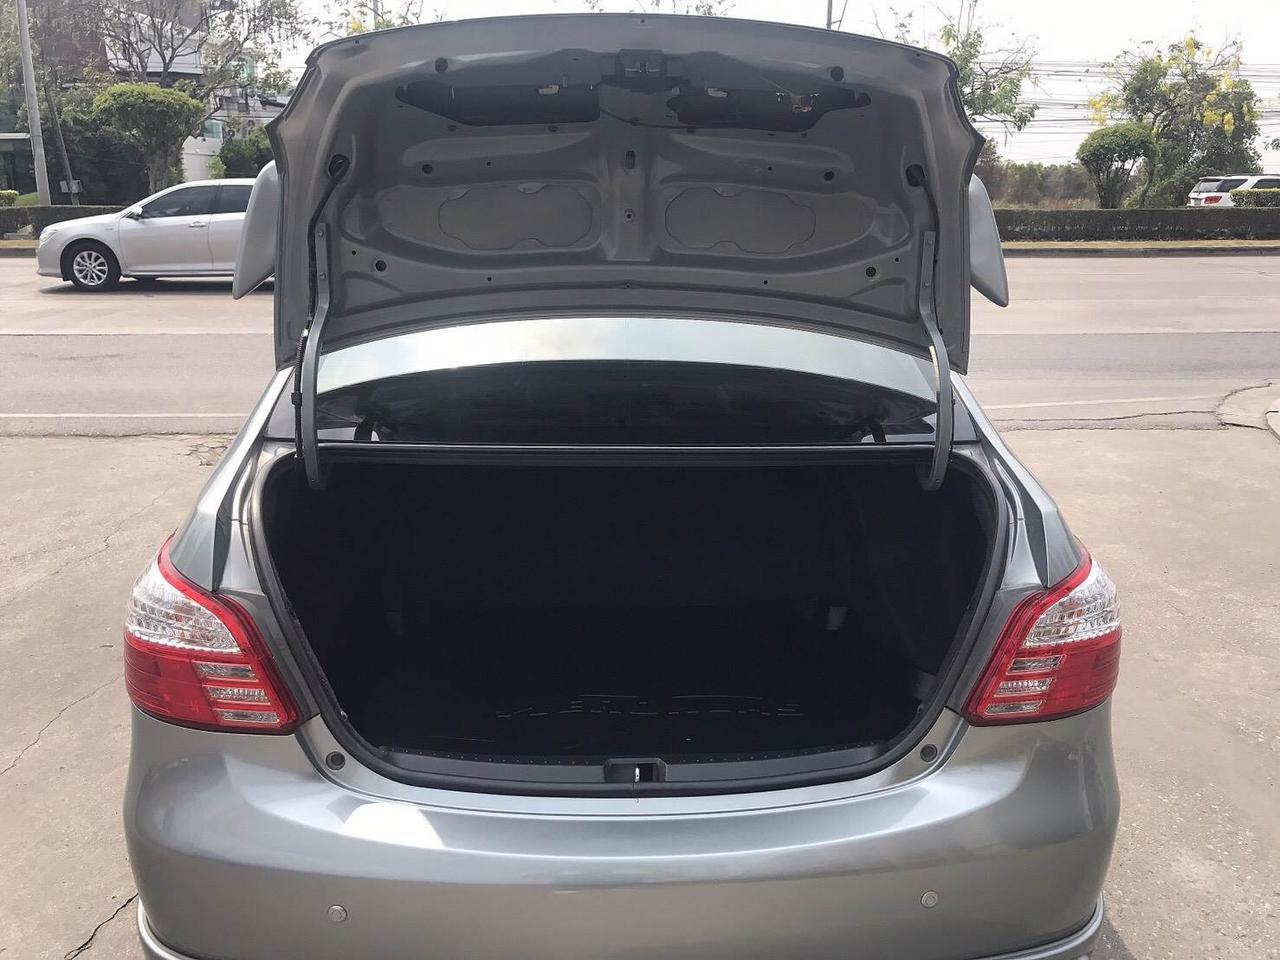 TOYOTA VIOS 1.5 J Auto ปี2011 ติดแก็สLPGหัวฉีดถังโดนัทสองระบบประหยัด รูปที่ 5